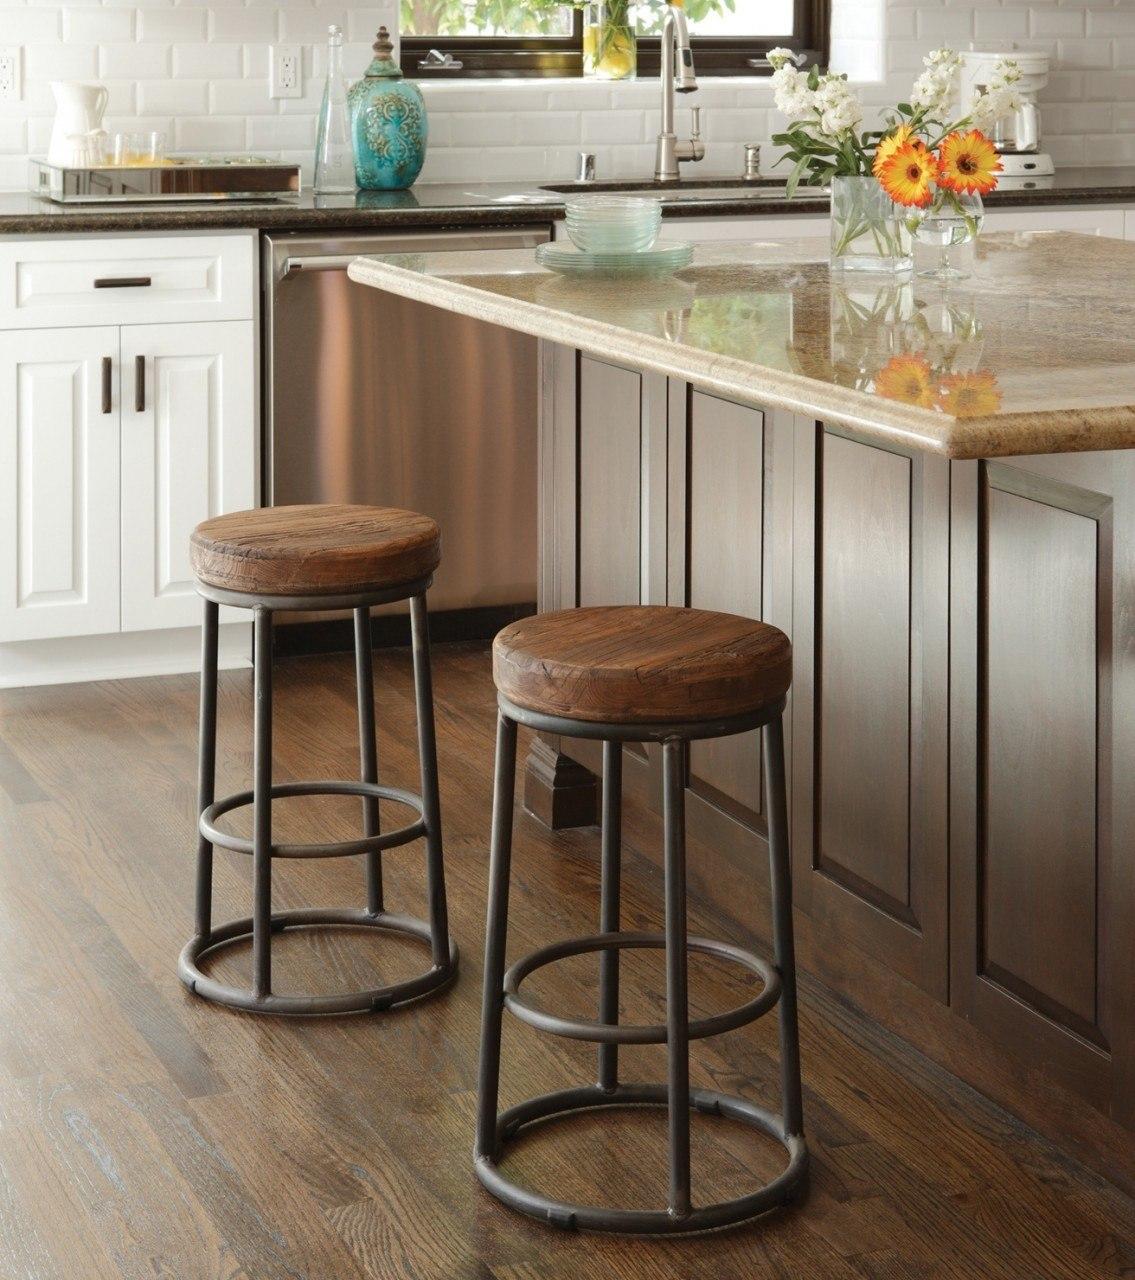 rustic bar stools industrial rustic barstool GWPNQAB